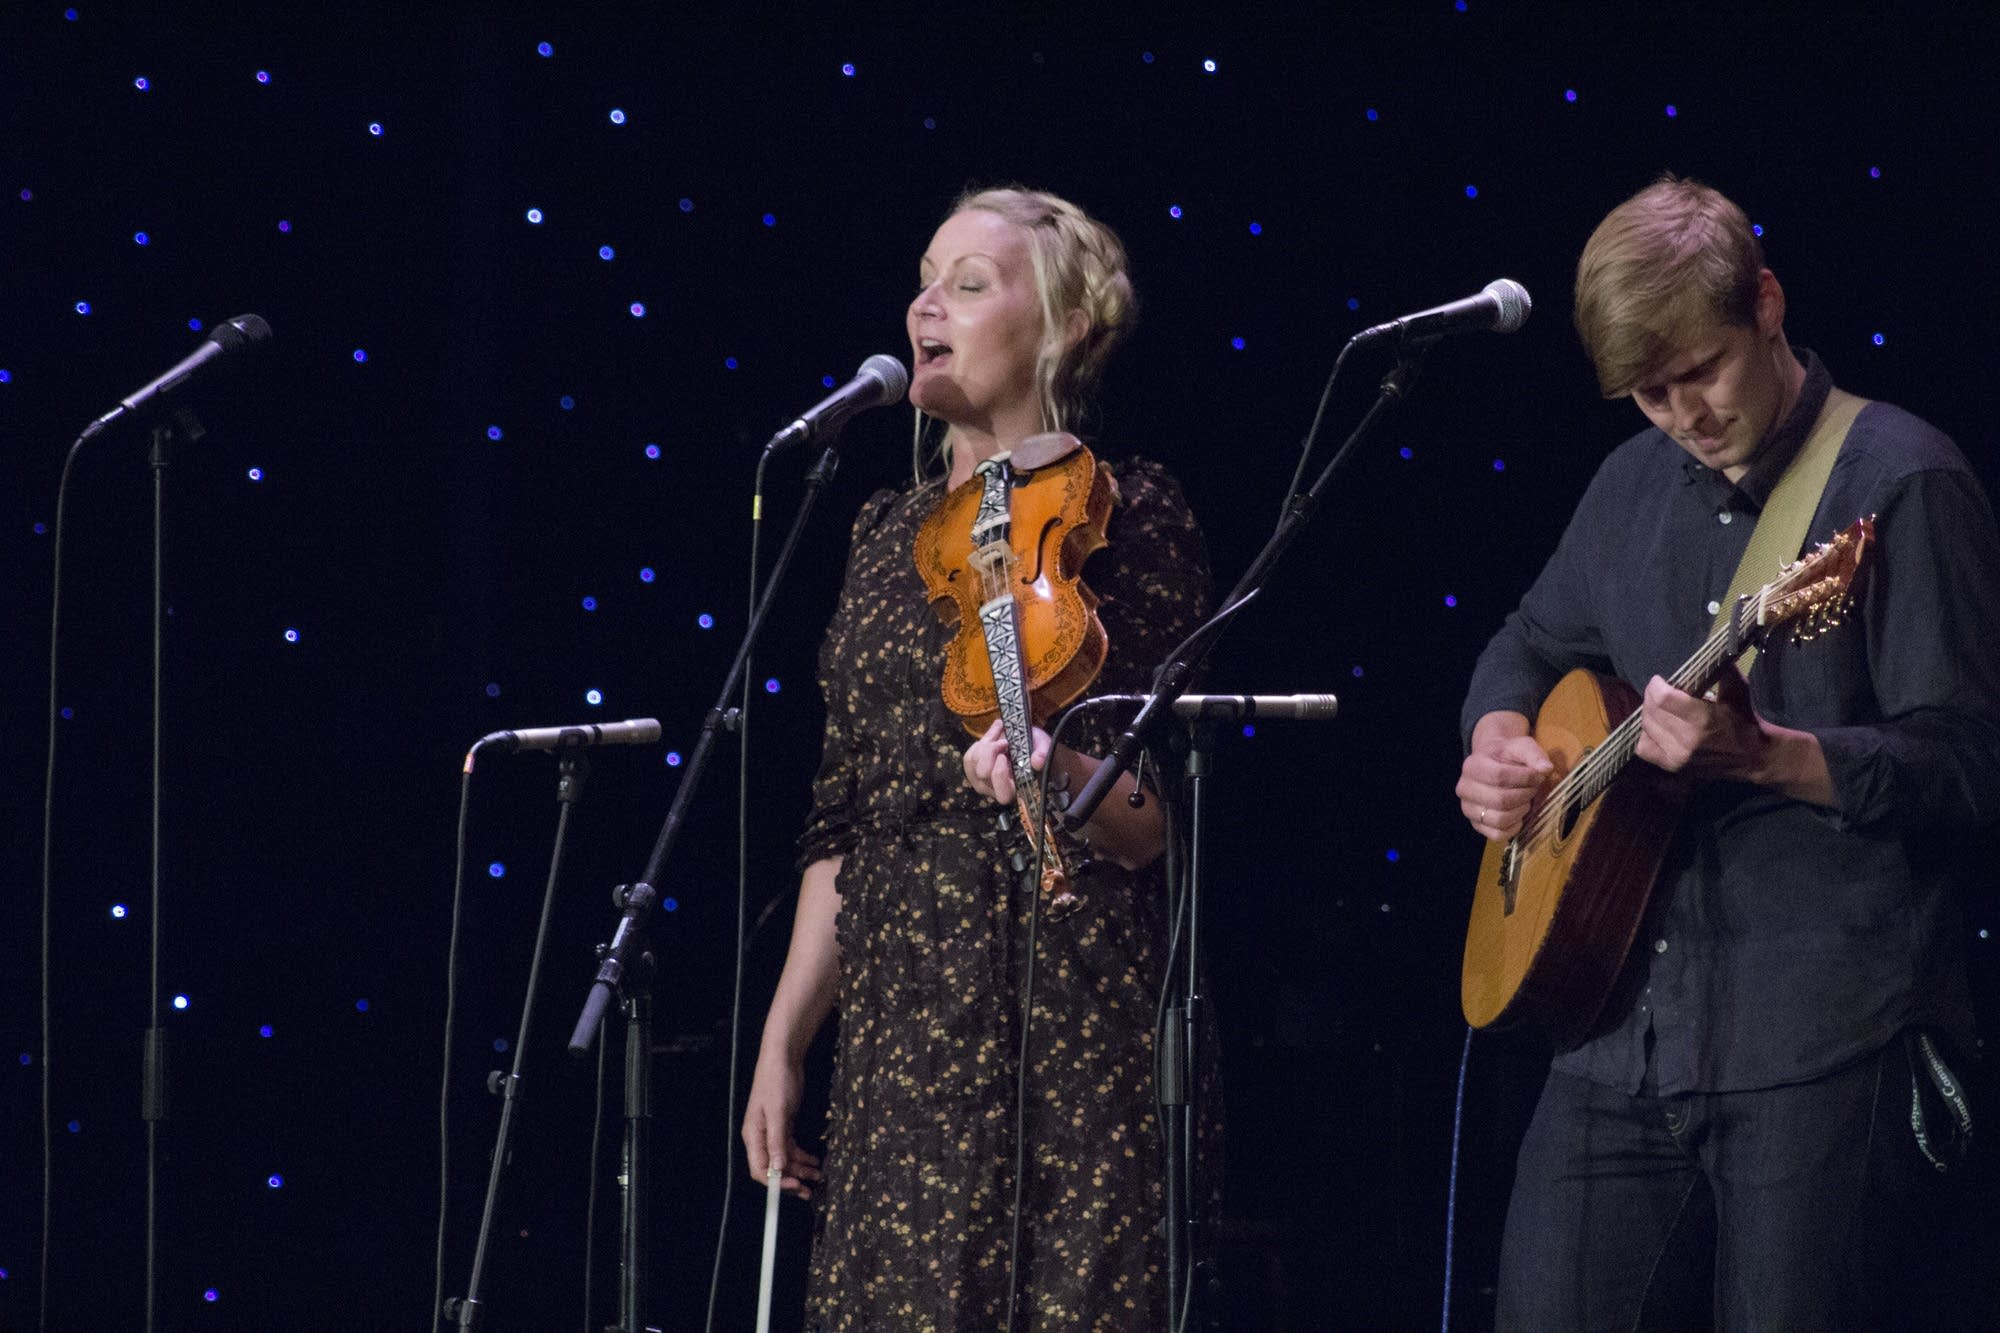 Invergordon - 07 - Sigrid and Torbjorn